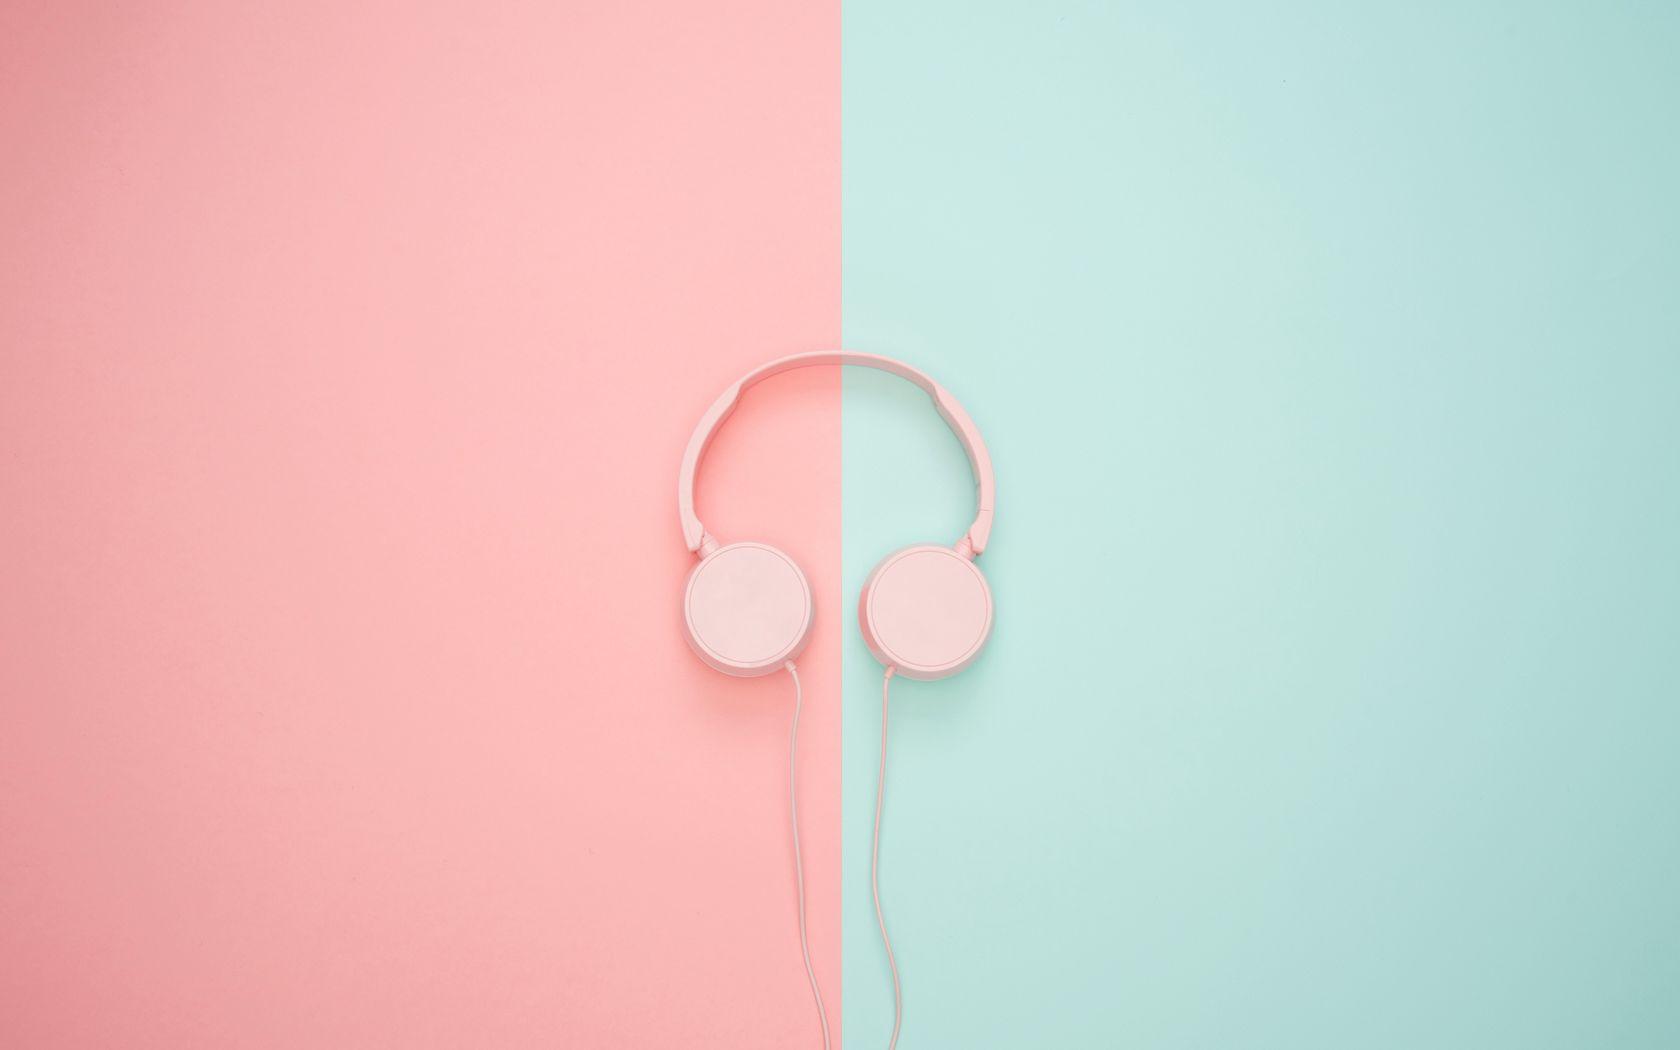 1680x1050 Wallpaper headphones, minimalism, pink, pastel